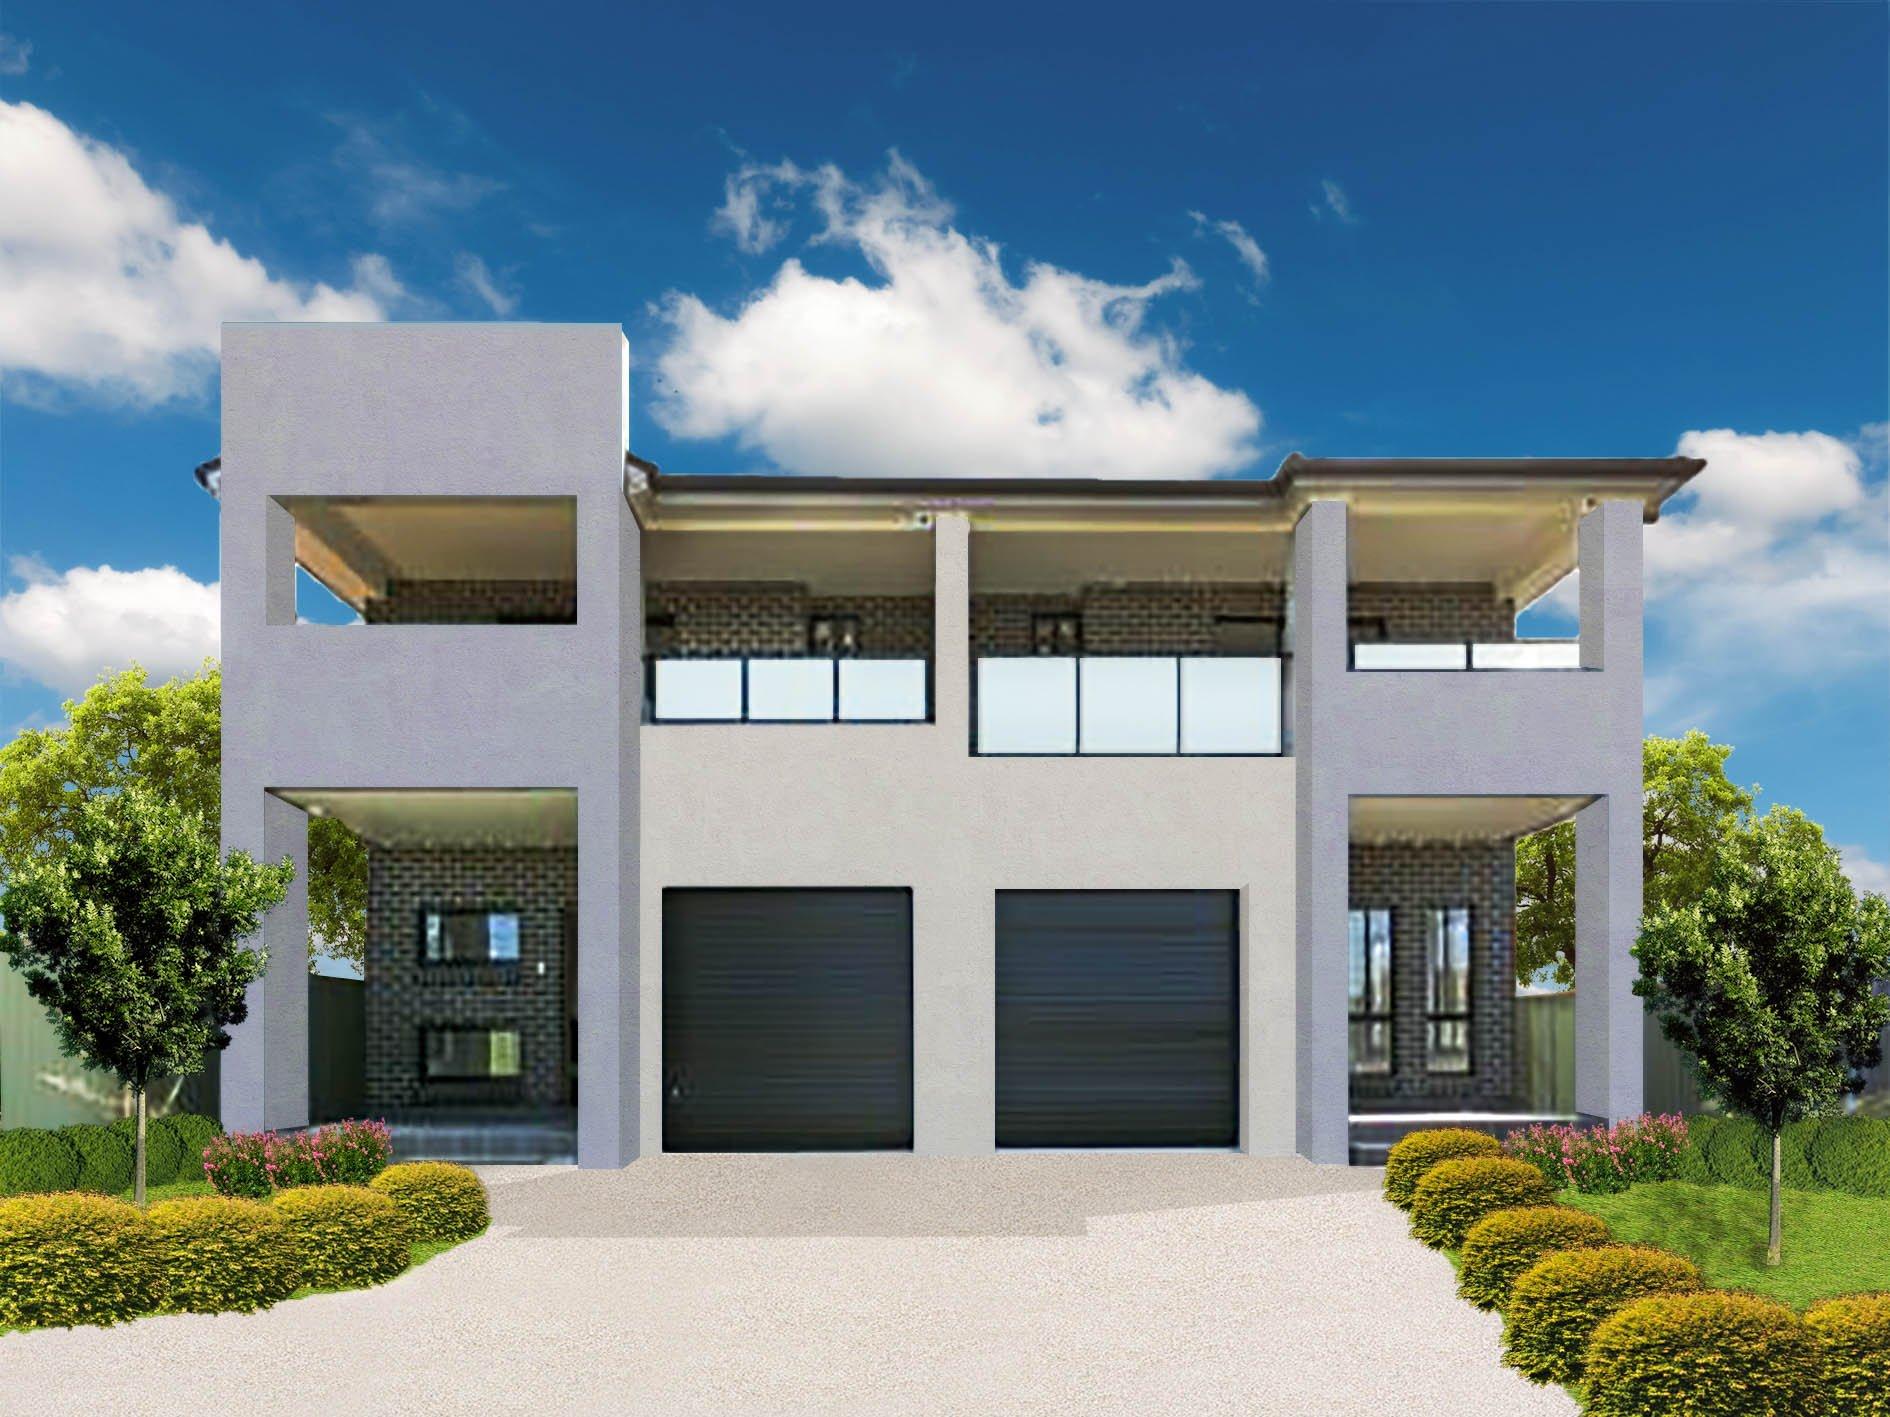 Duplex home builder duplex home builders sydney for Duplex home designs sydney